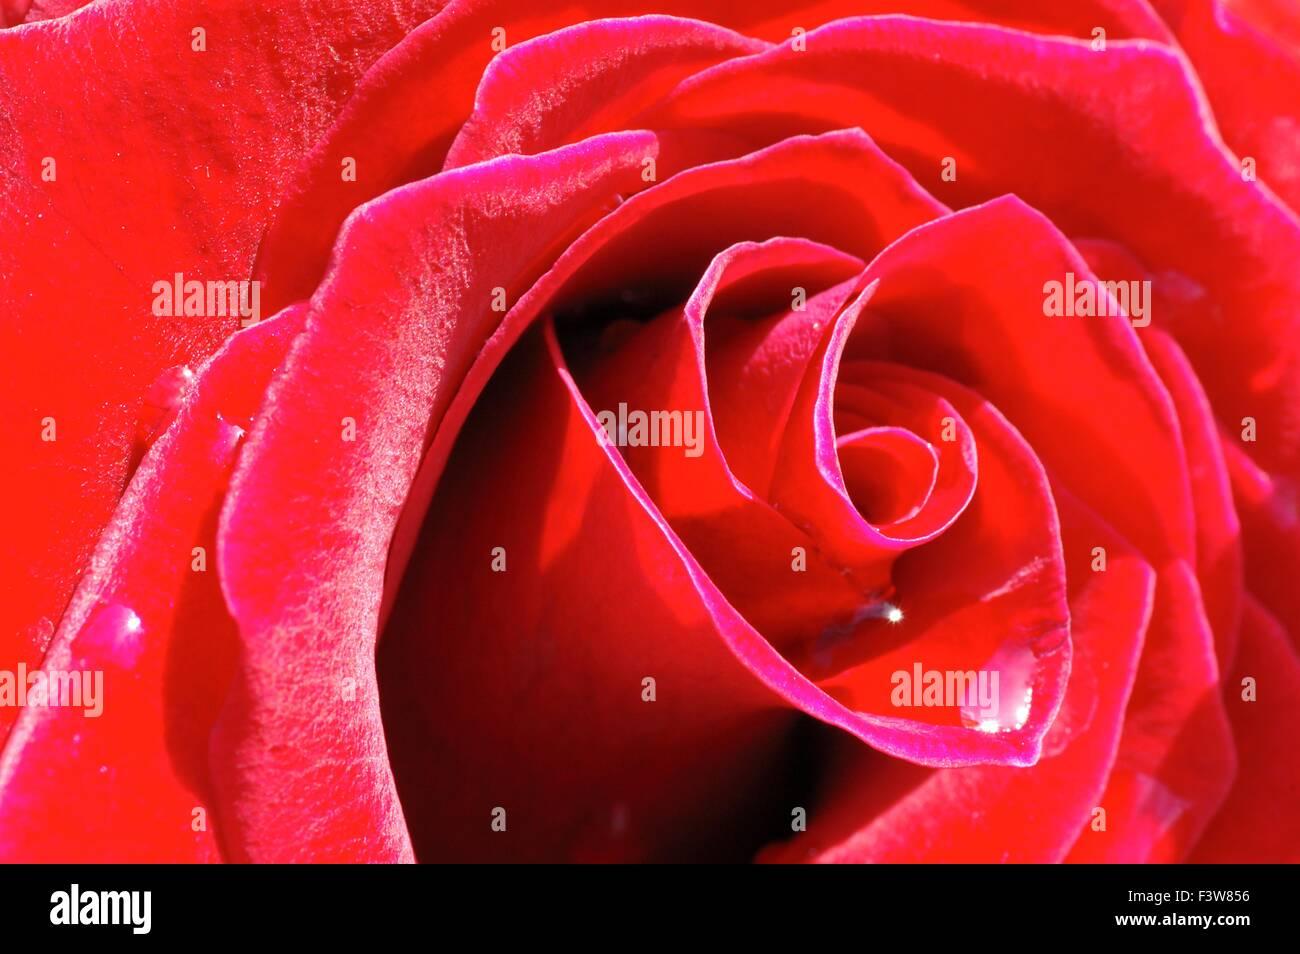 tenderness - Stock Image